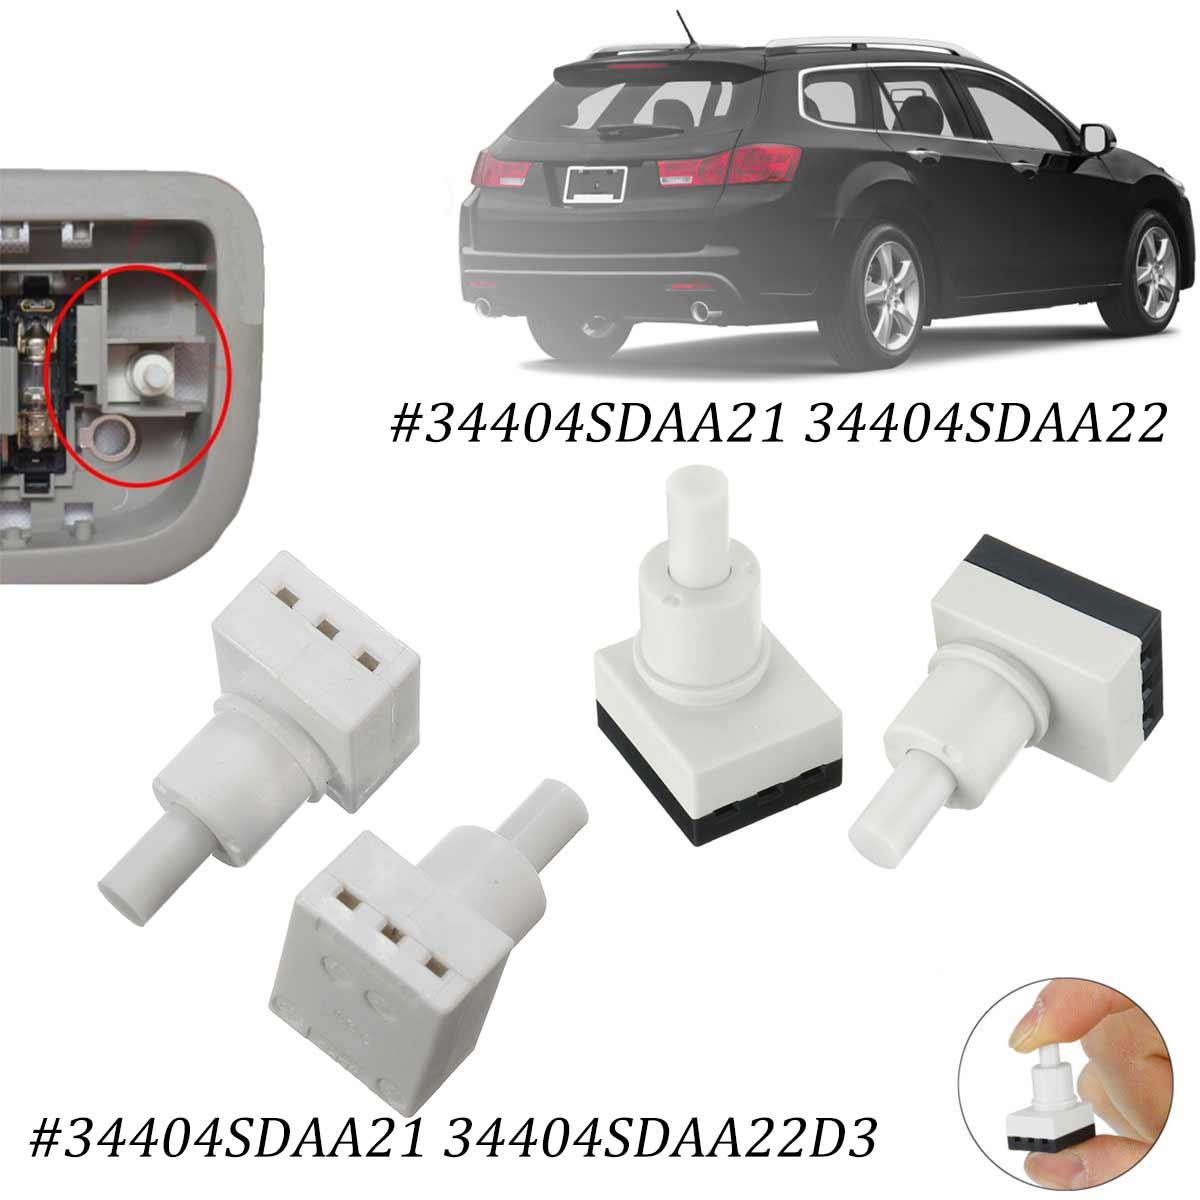 Pair Interior Dome Light Lamp Switch Sensor Fit For Honda For Accord For CR-V Pilot For Odyssey Pilot 34404SDAA21 34404SDAA22